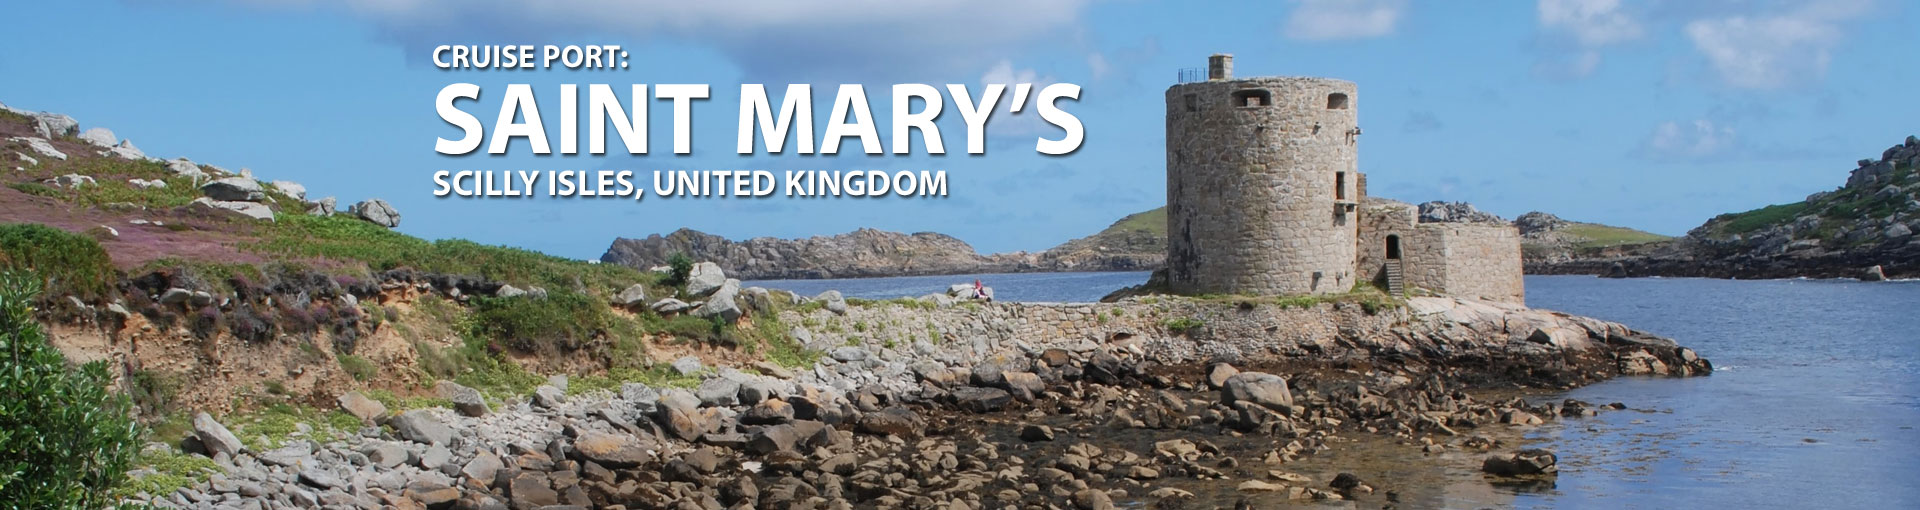 Cruises to Saint Mary